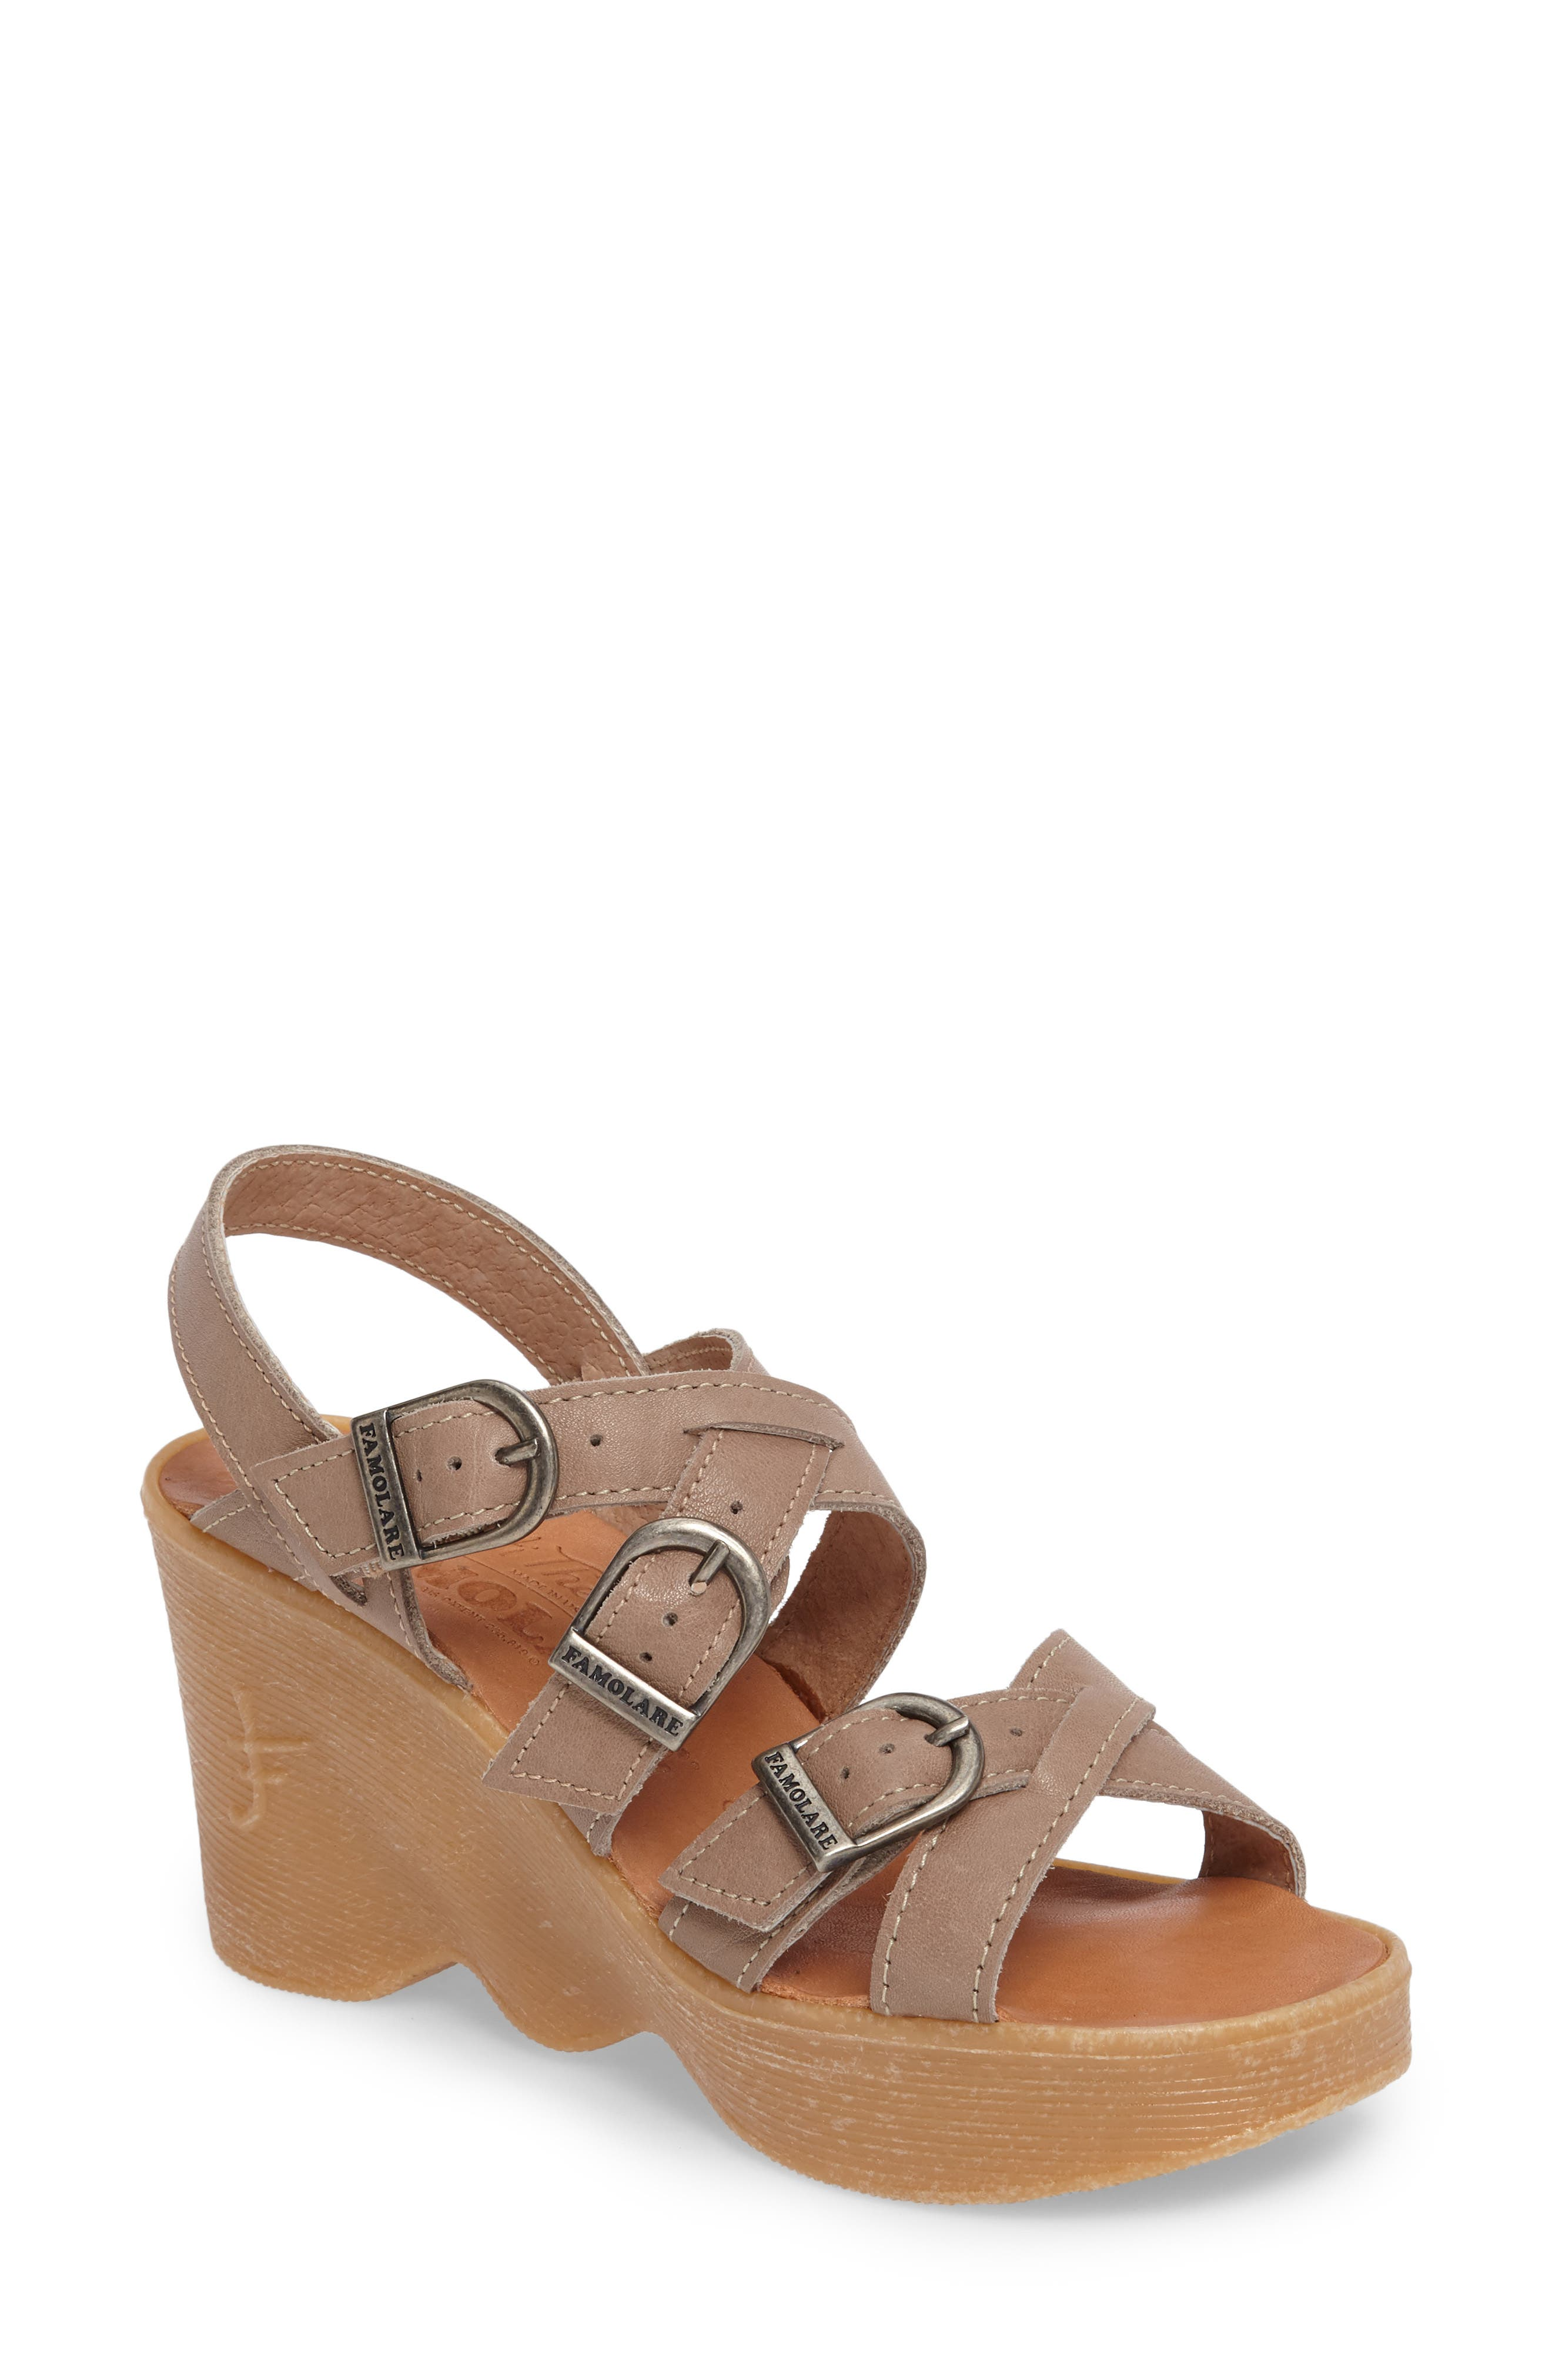 Famolare Buckle Up Wedge Sandal (Women)